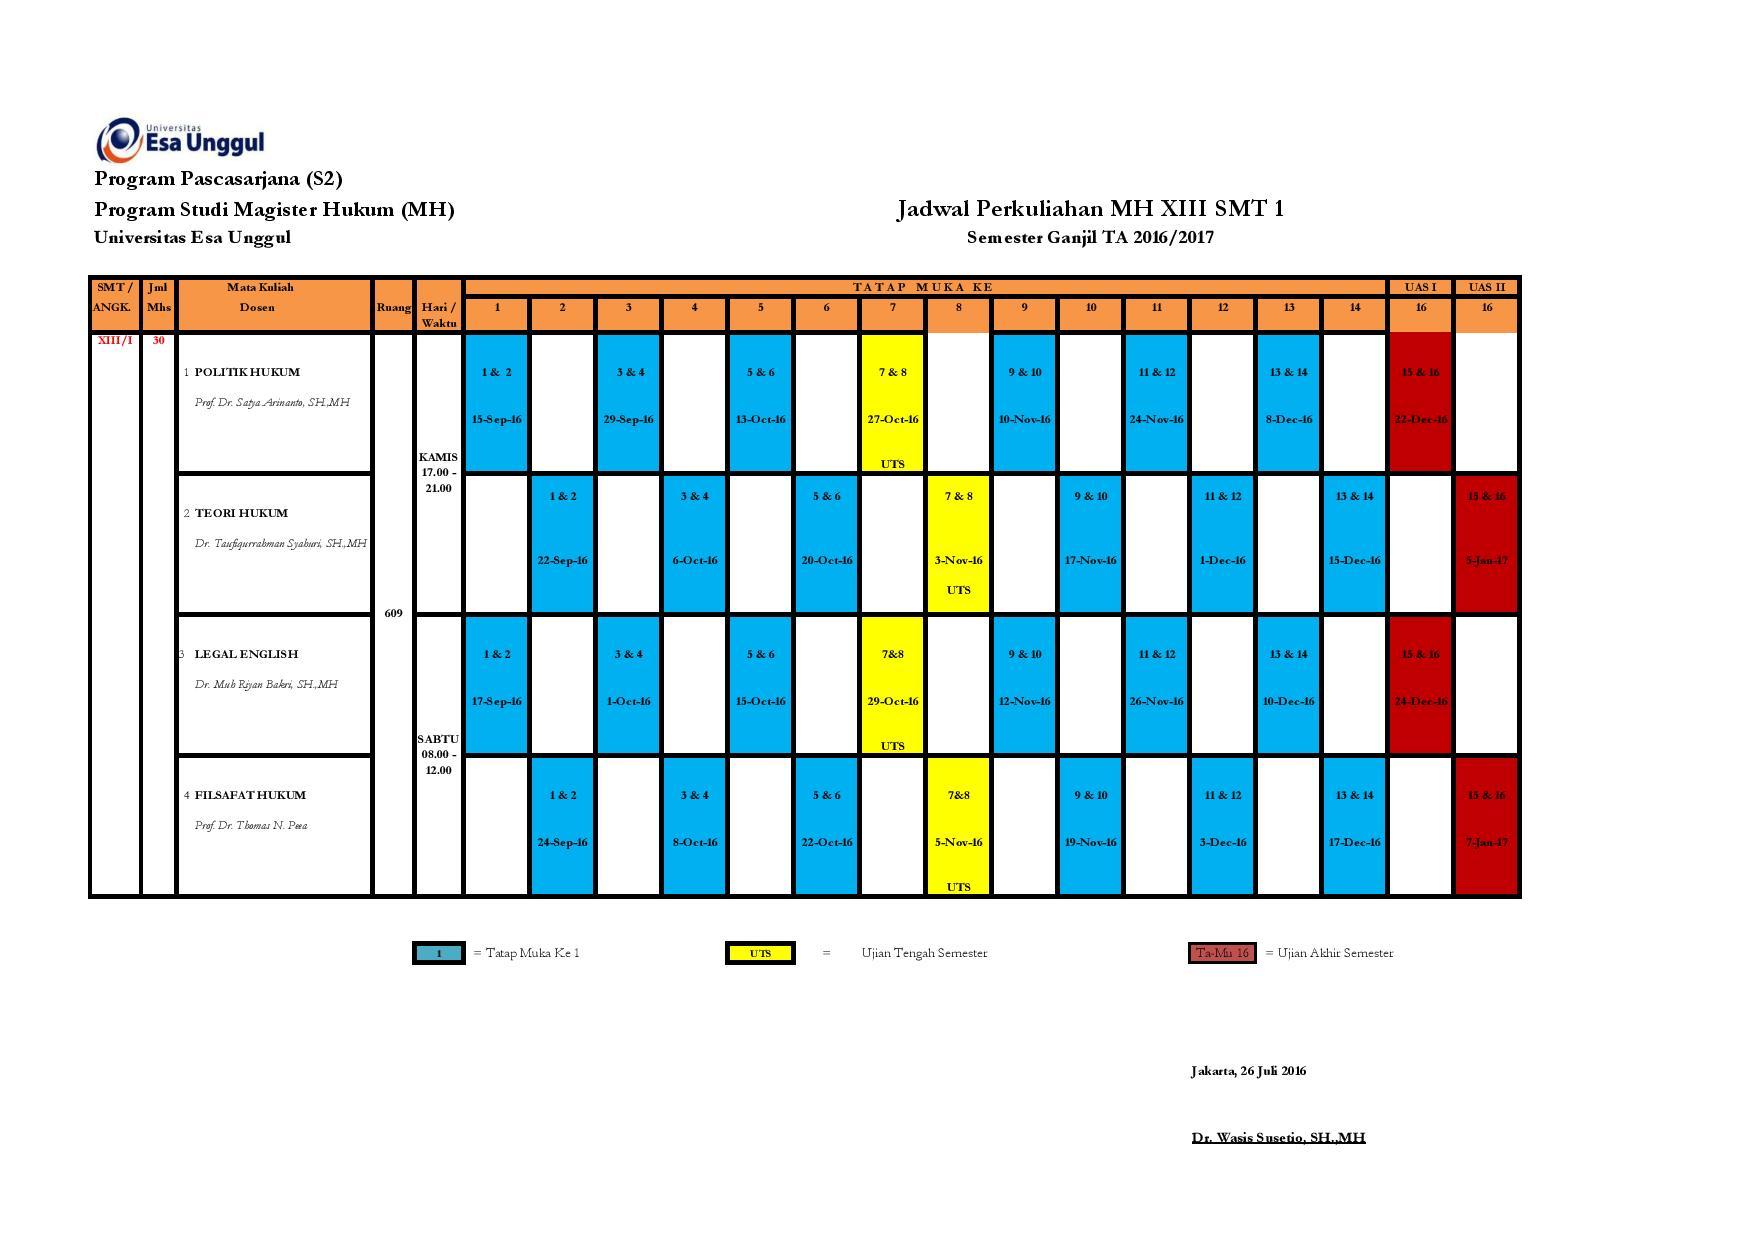 Jadwal Perkuliahan MH XIII SMT 1